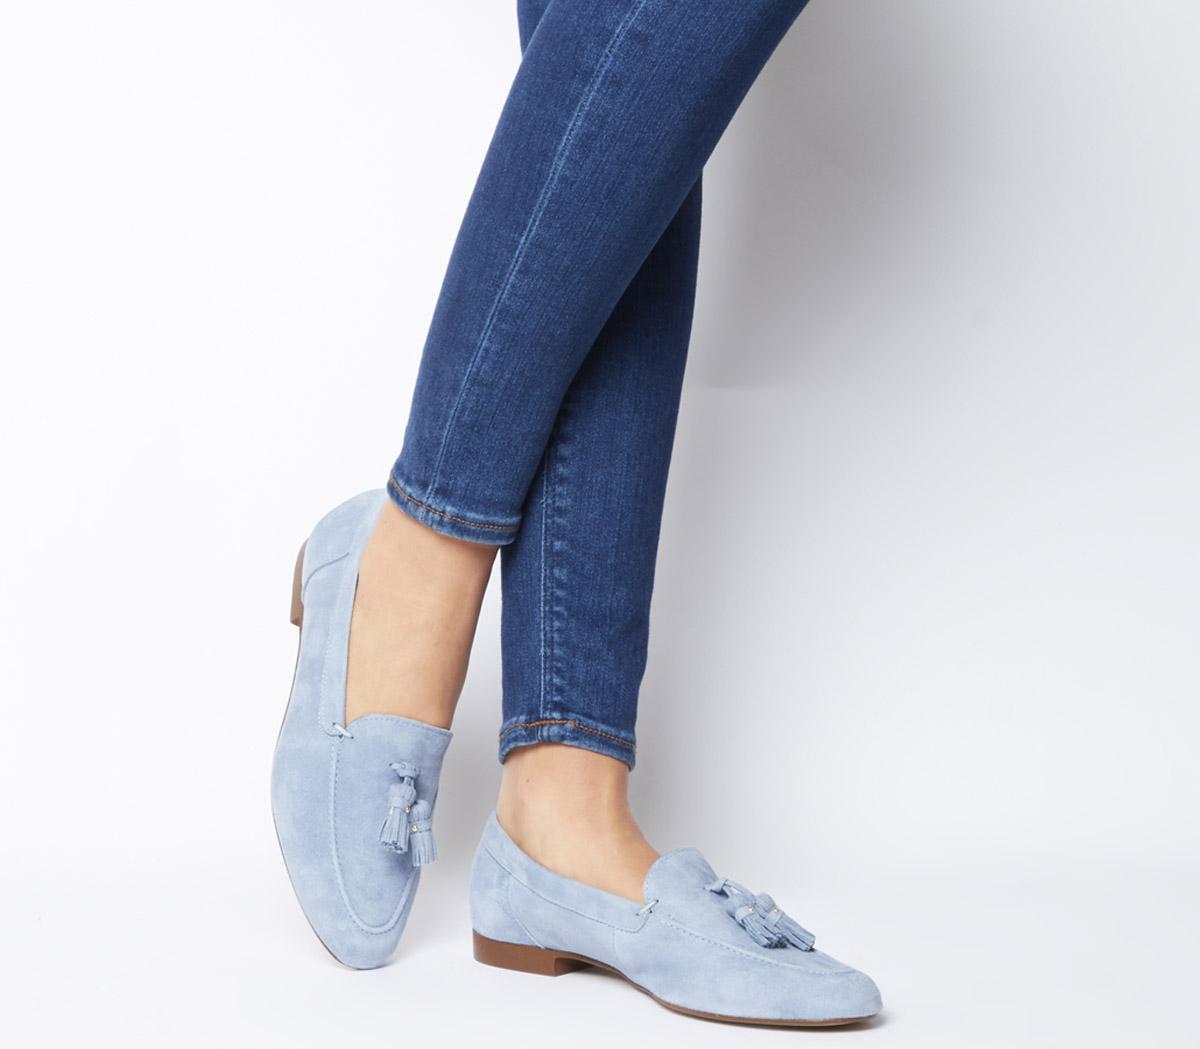 Office Retro Tassel Loafers Light Blue